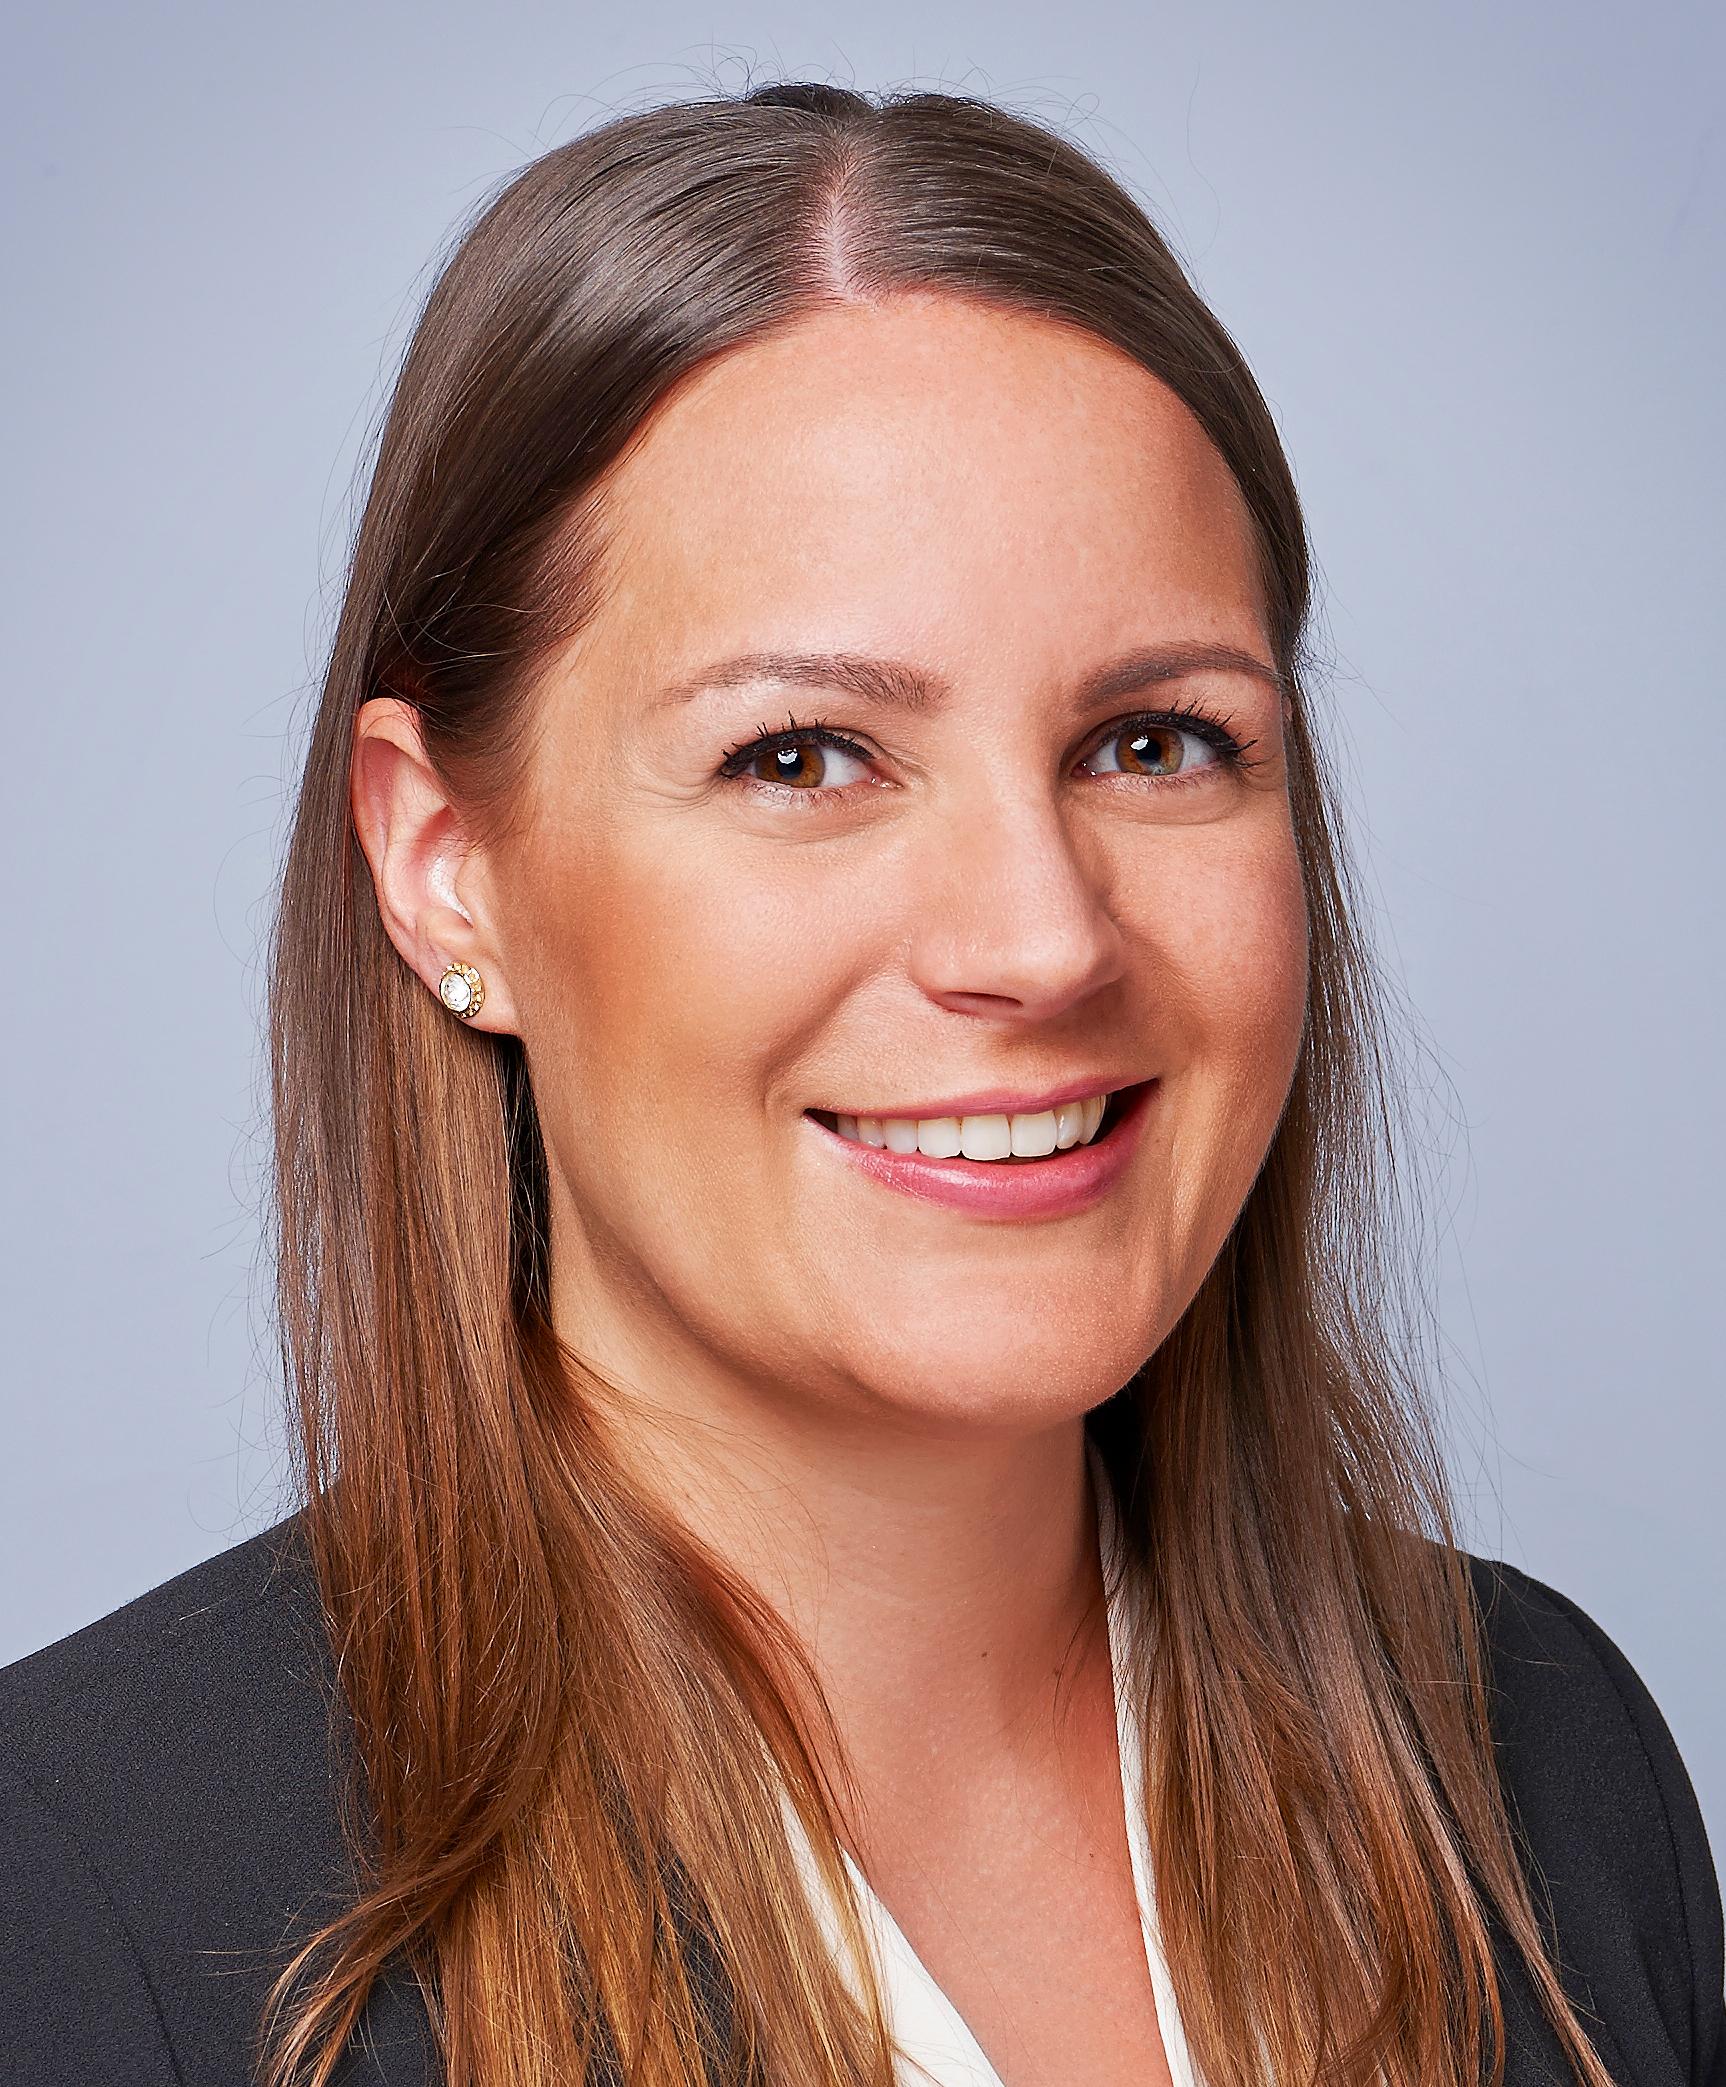 Karin Heim